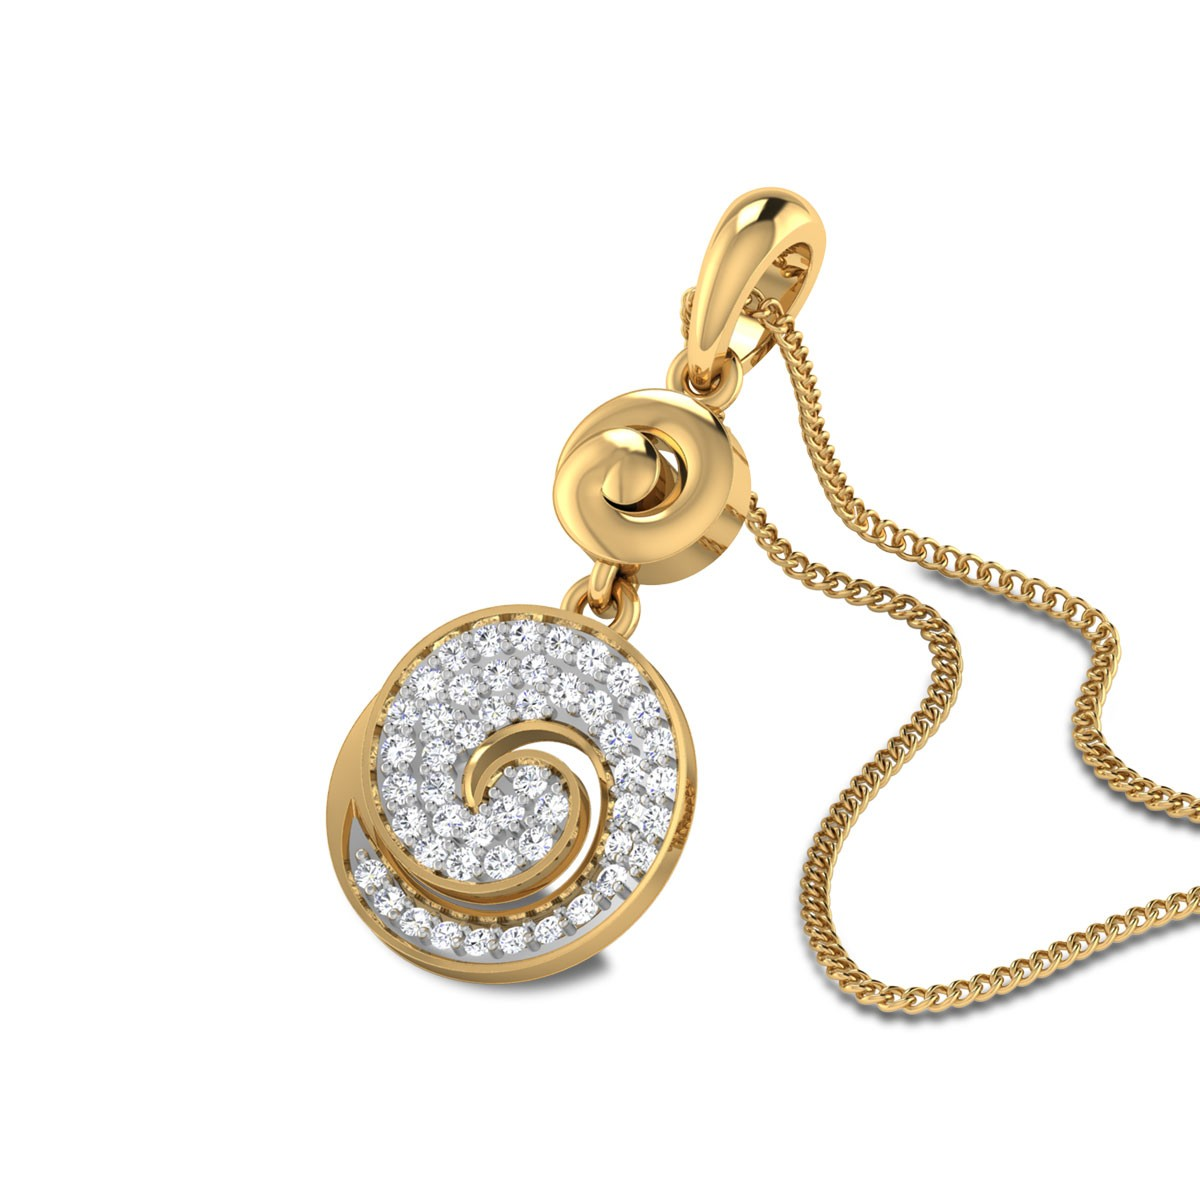 Reiley Swirl Diamond Pendant